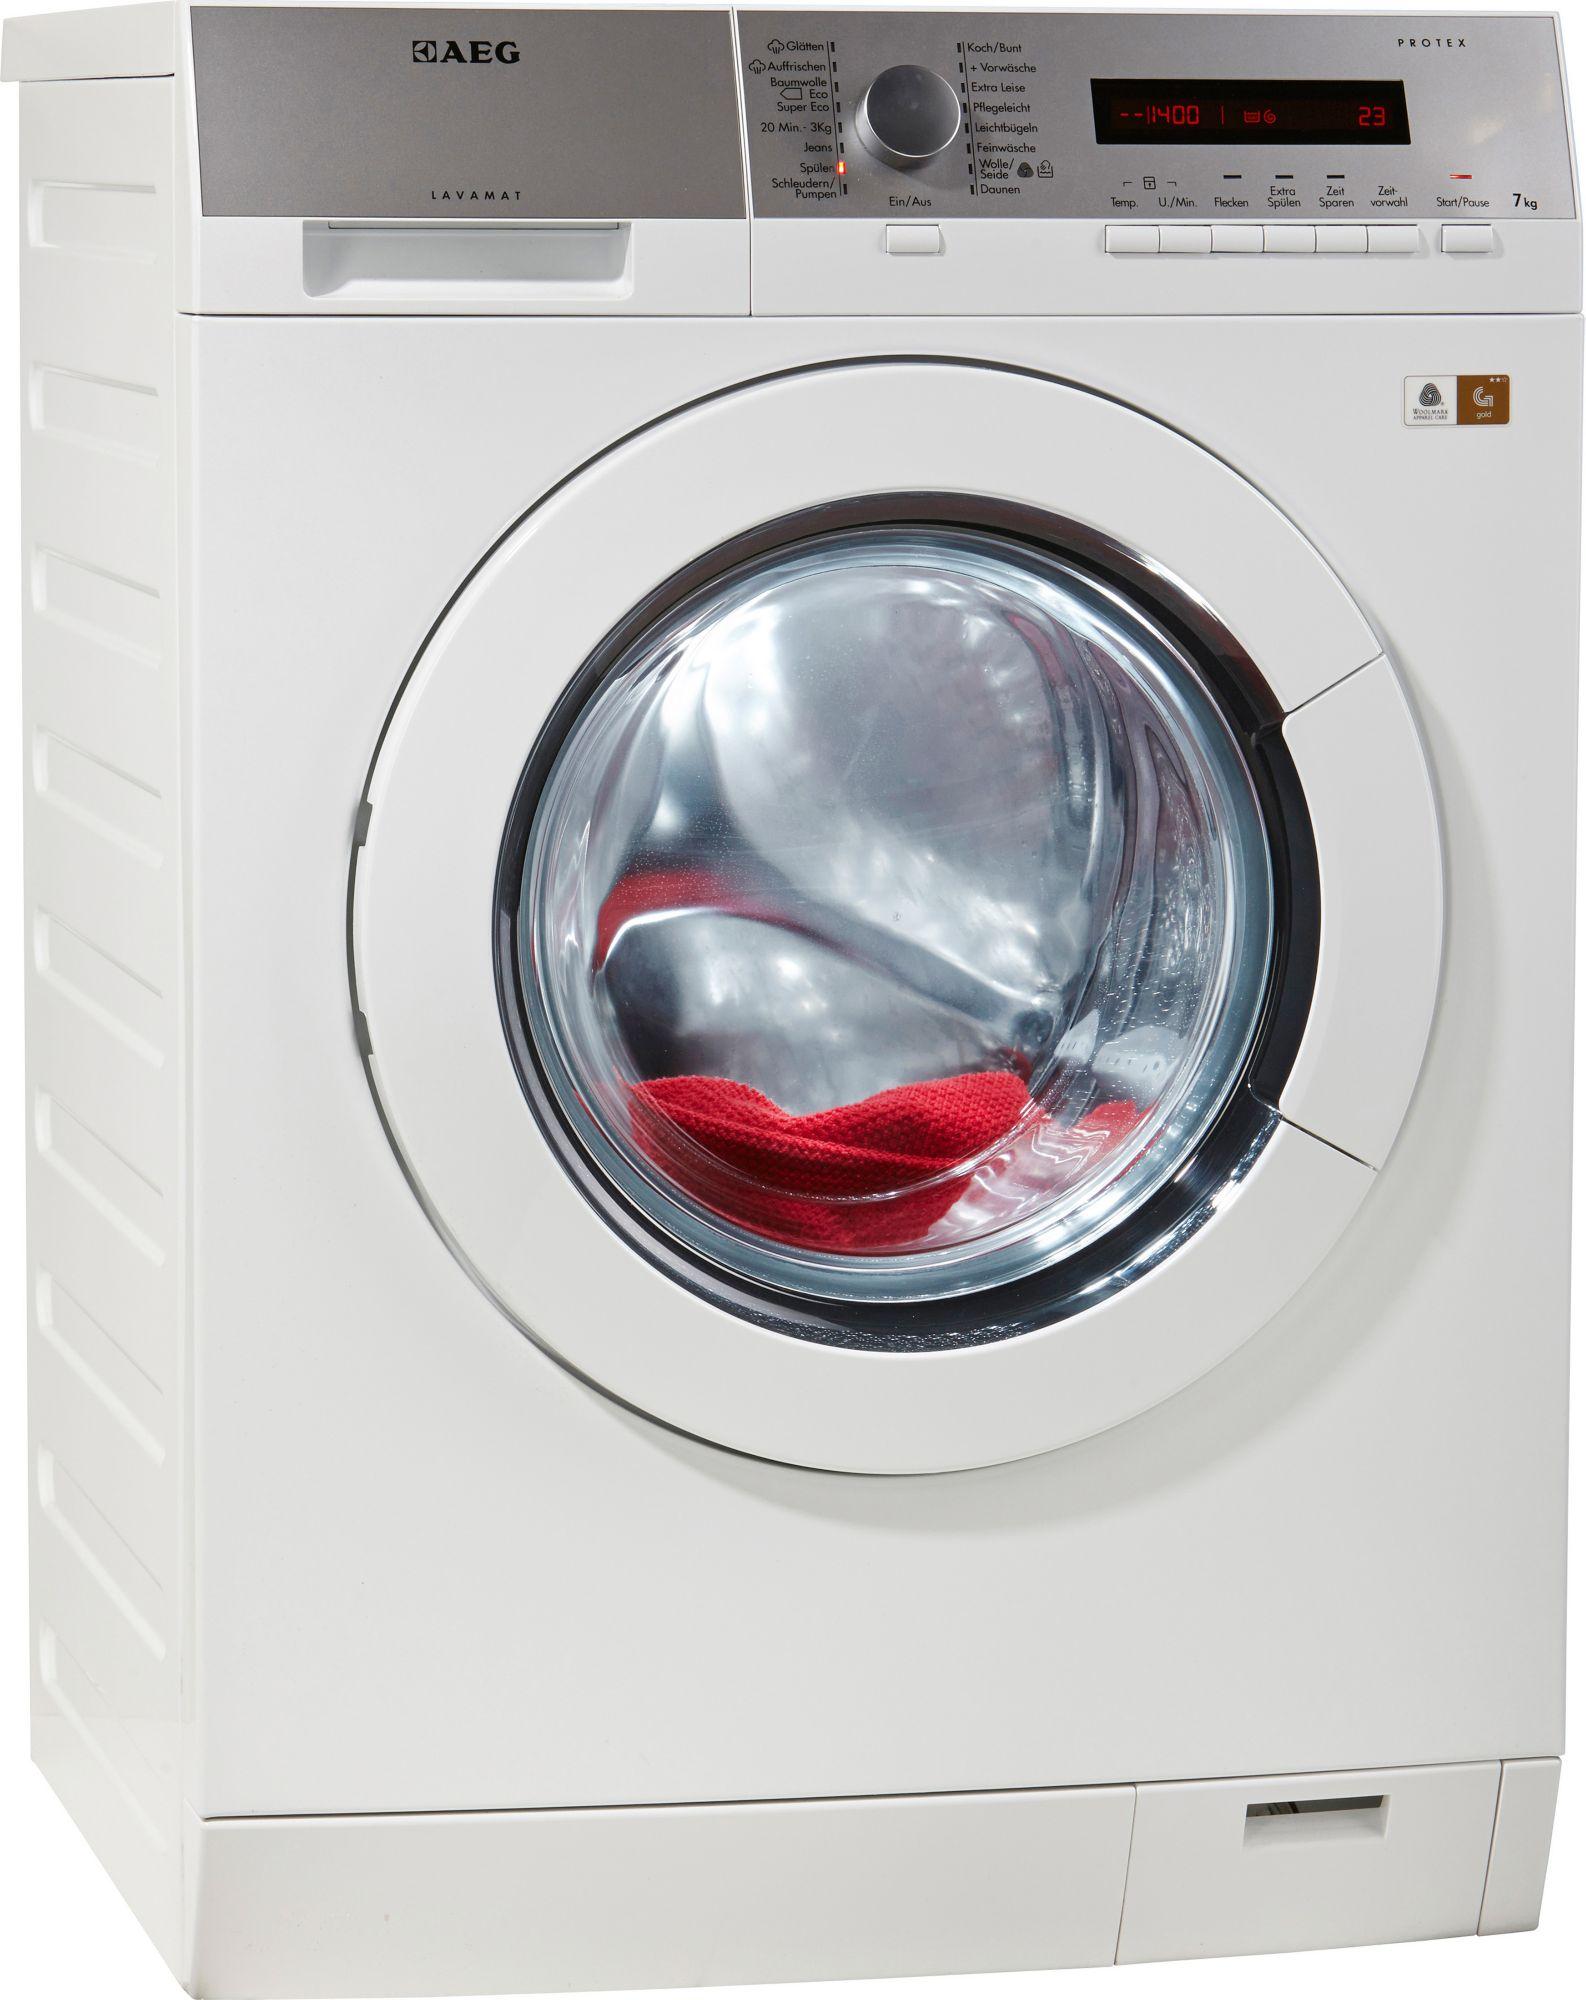 aeg waschmaschine lavamat l76471pfl a 7 kg 1400 u min schwab versand waschmaschinen. Black Bedroom Furniture Sets. Home Design Ideas